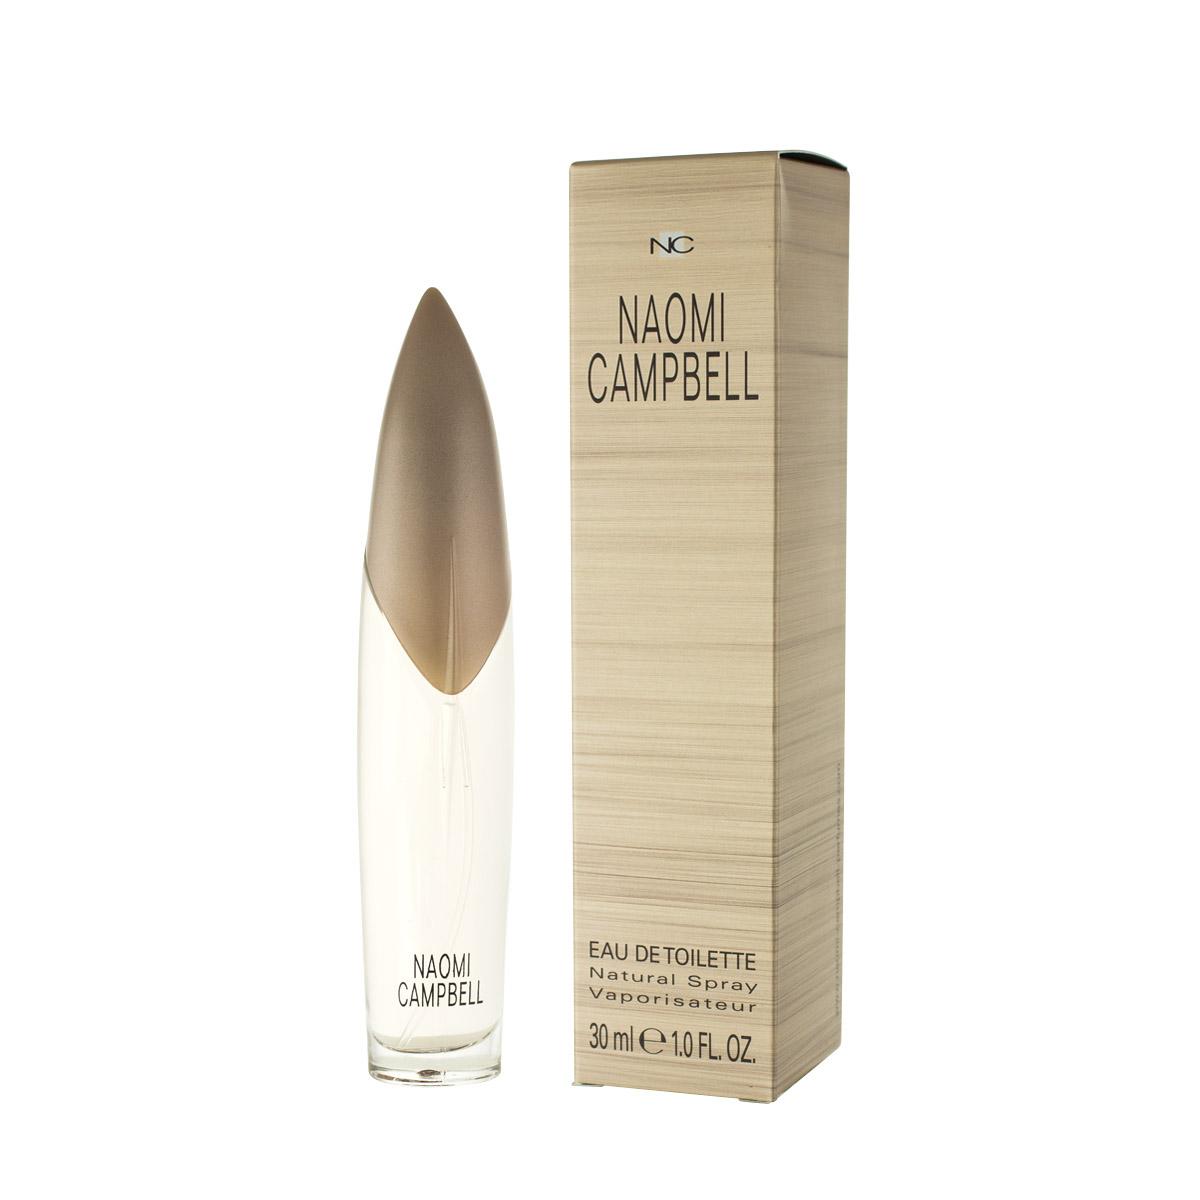 Naomi Campbell Naomi Campbell Eau De Toilette 30 ml (woman) 53985